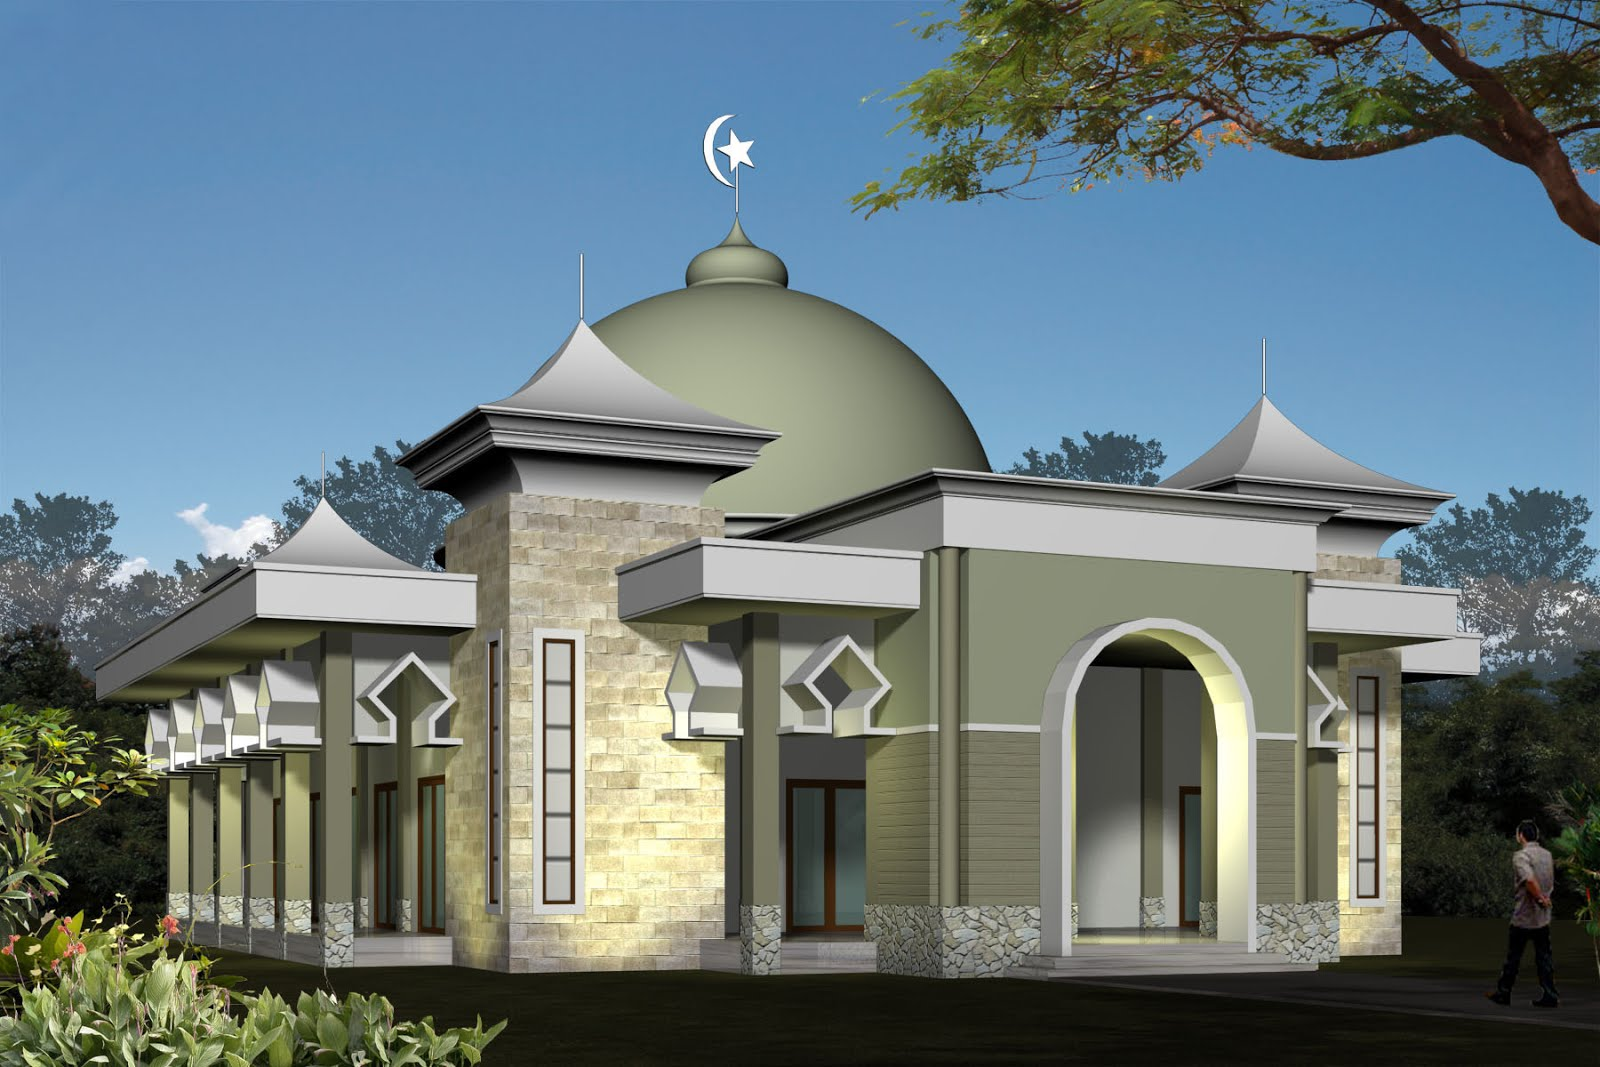 30 Model Masjid Minimalis Dengan Model Masjid Modern Dari